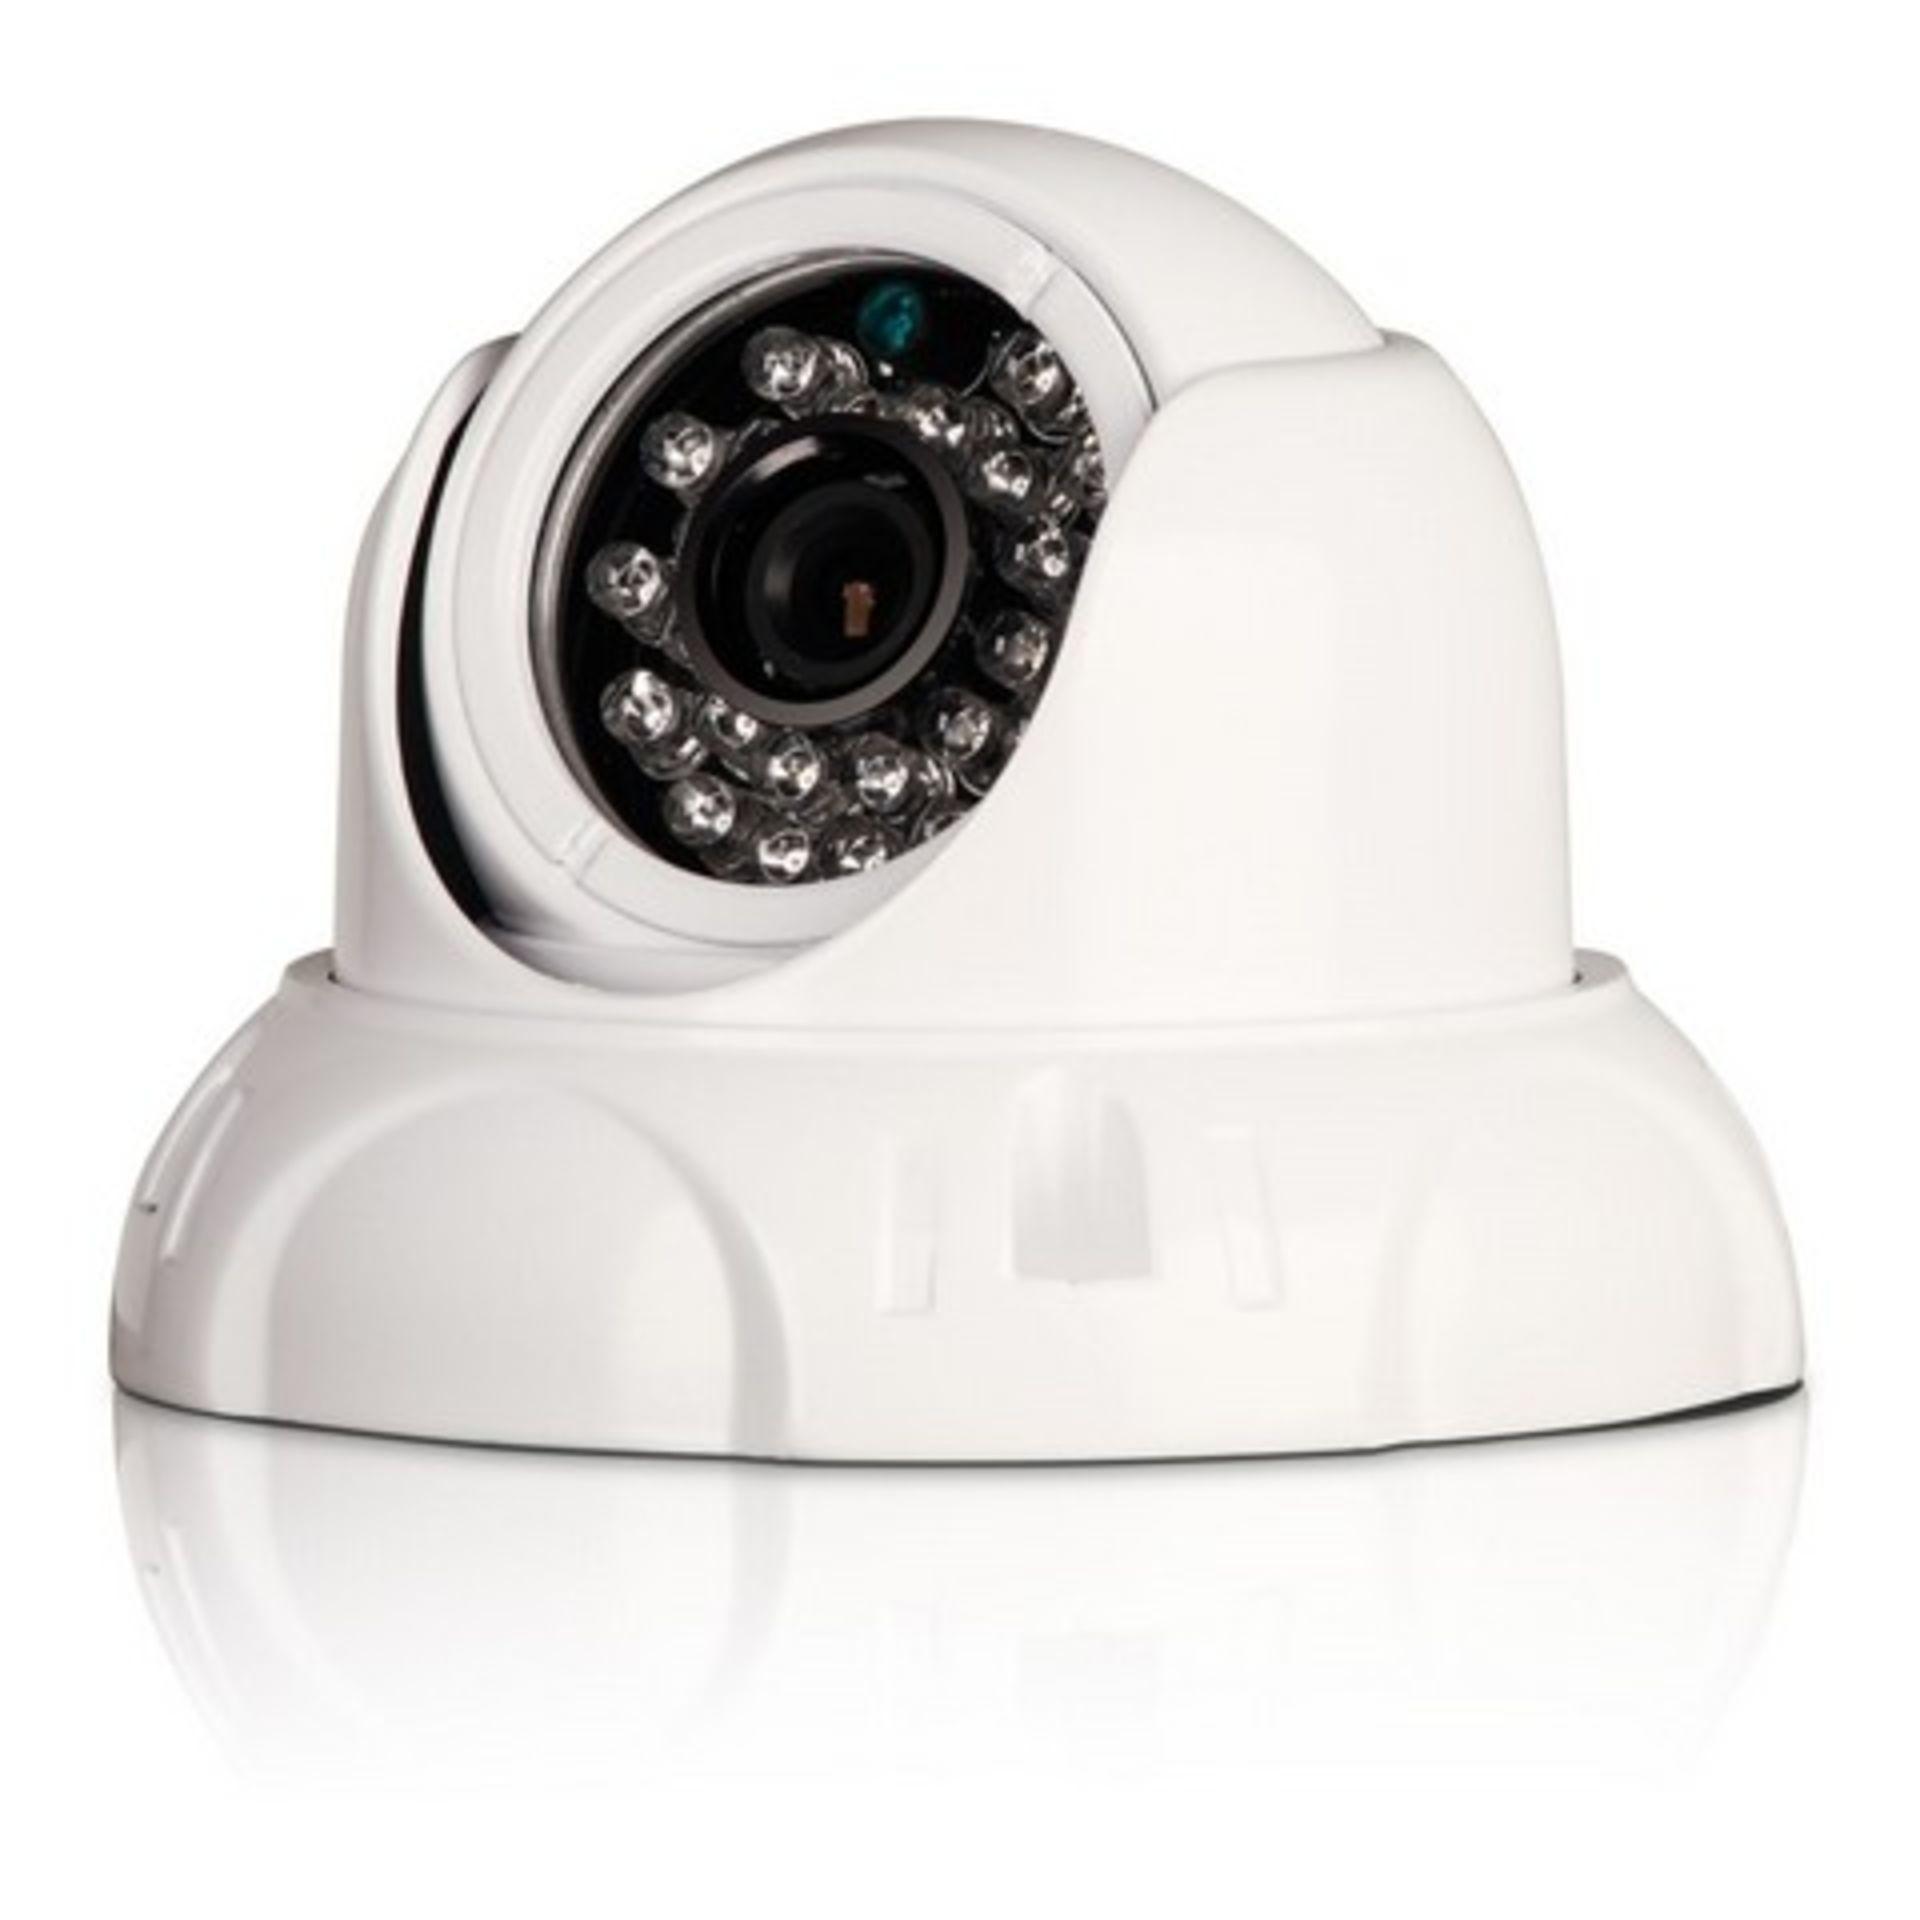 + VAT Brand New Swann C1736 Alpha Series Multi-Purpose Day And Night Dome Camera - 700TVL - IP67